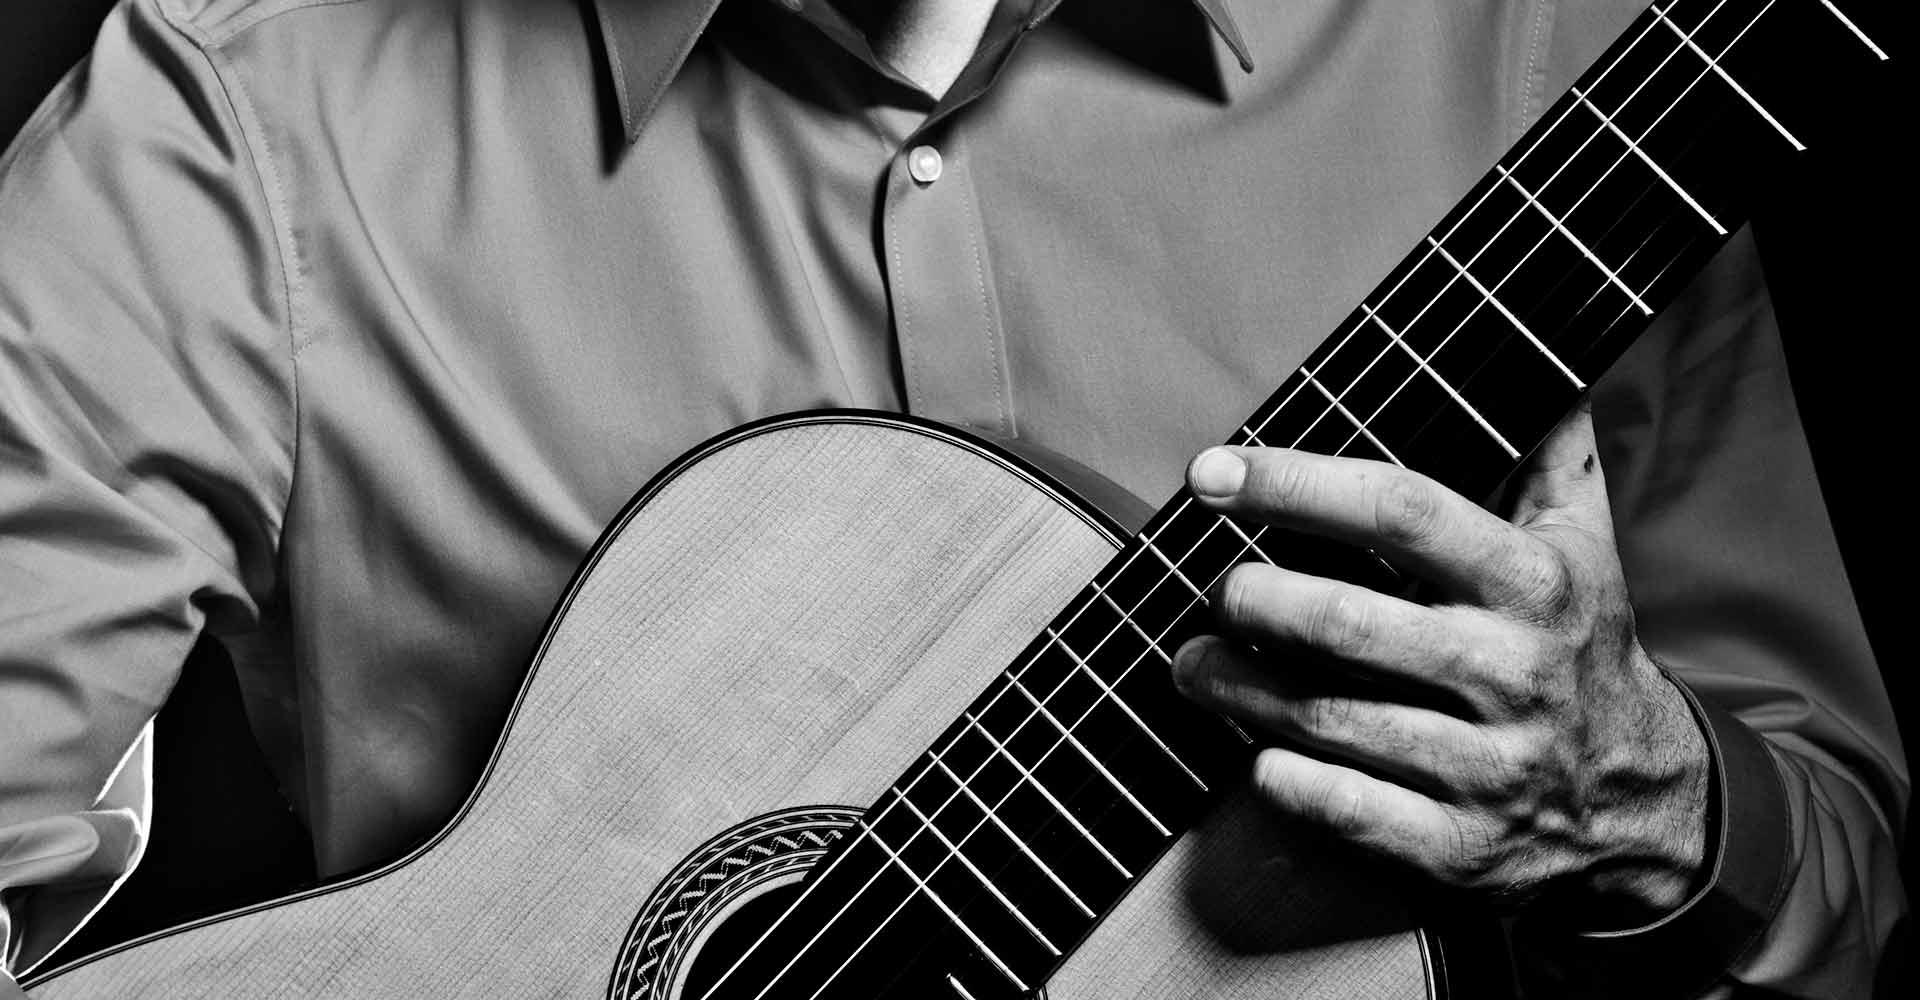 gitarrenunterricht-berlin-slide-unterrichtsmethode